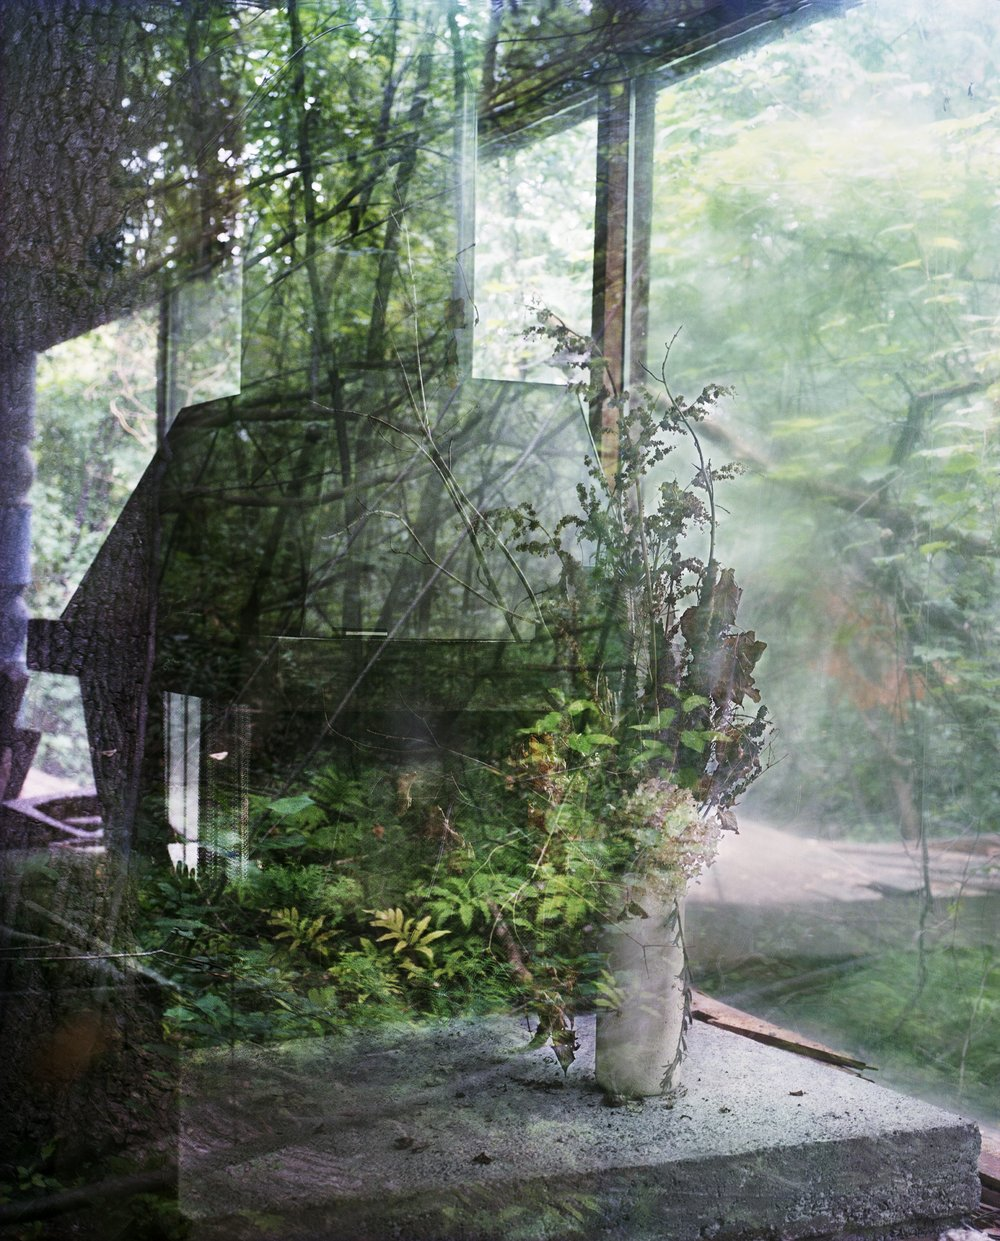 "Lorna Bauer, A Time Capsule, a True Abode 1, 2017, impression jet d'encre, 40"" x 32"" (102 x 81 cm)."